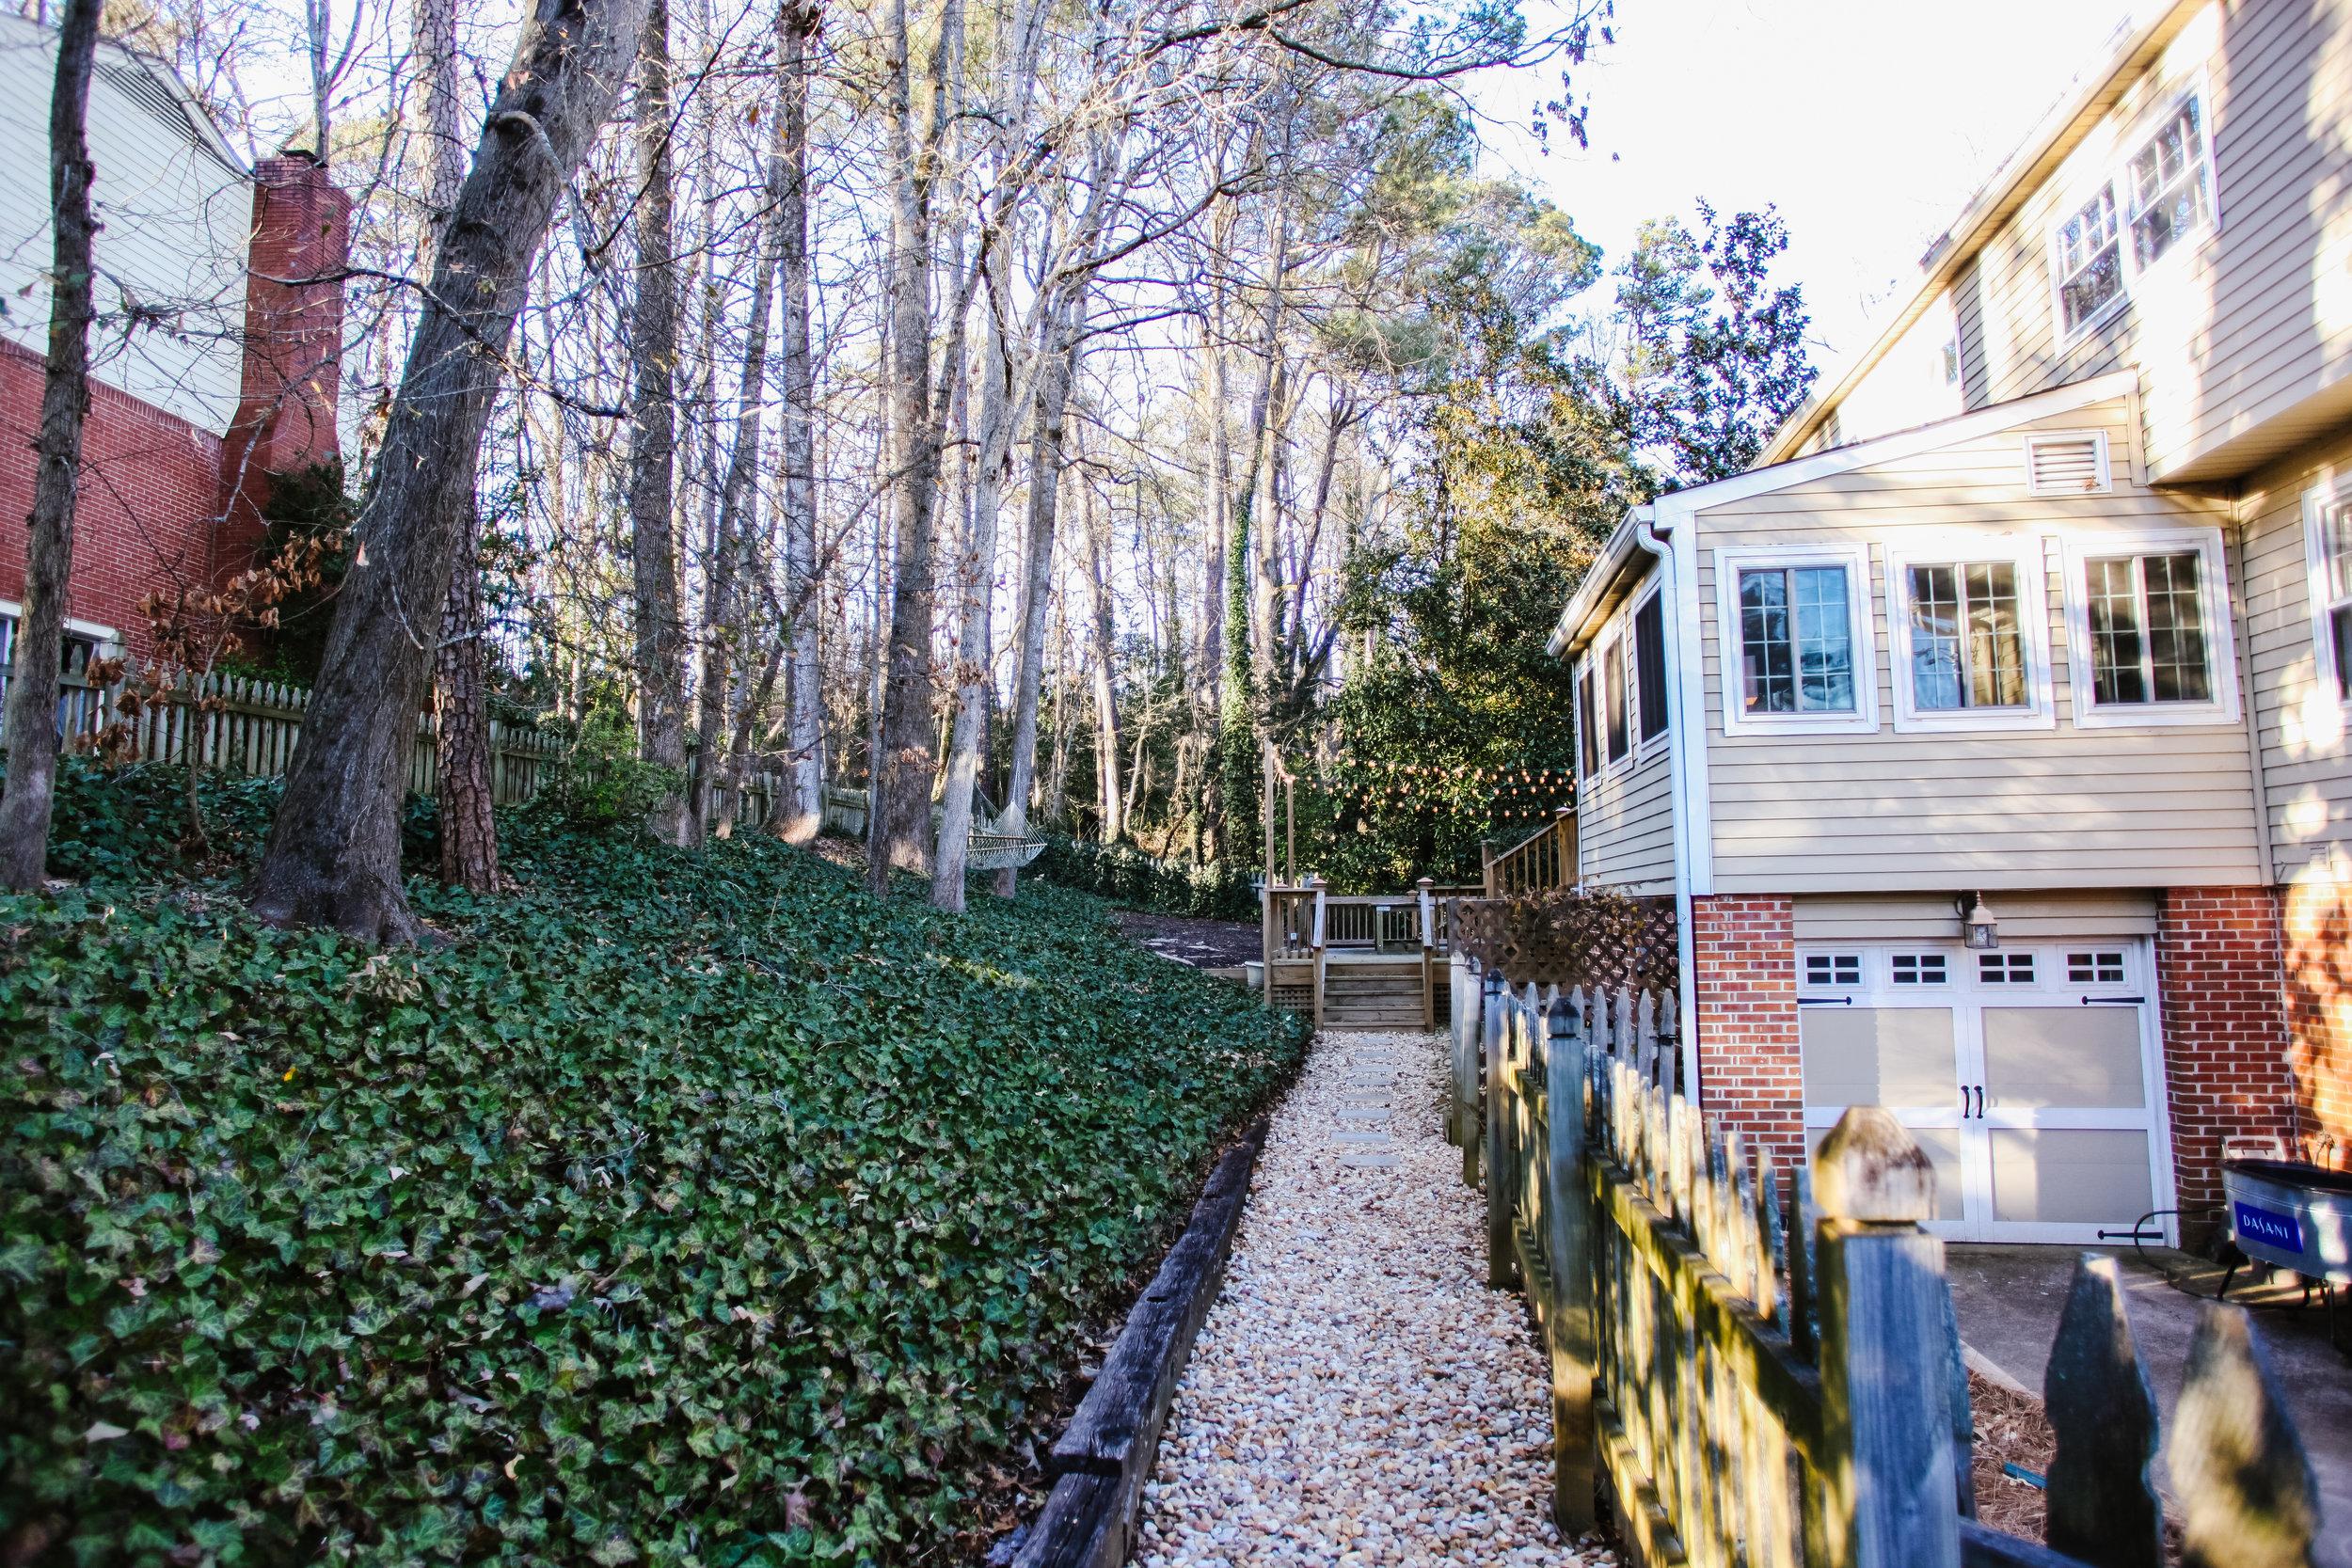 wingard-real-estate-sandy-springs-dream-home-backyard-goals-atlanta-buckhead-76.jpg